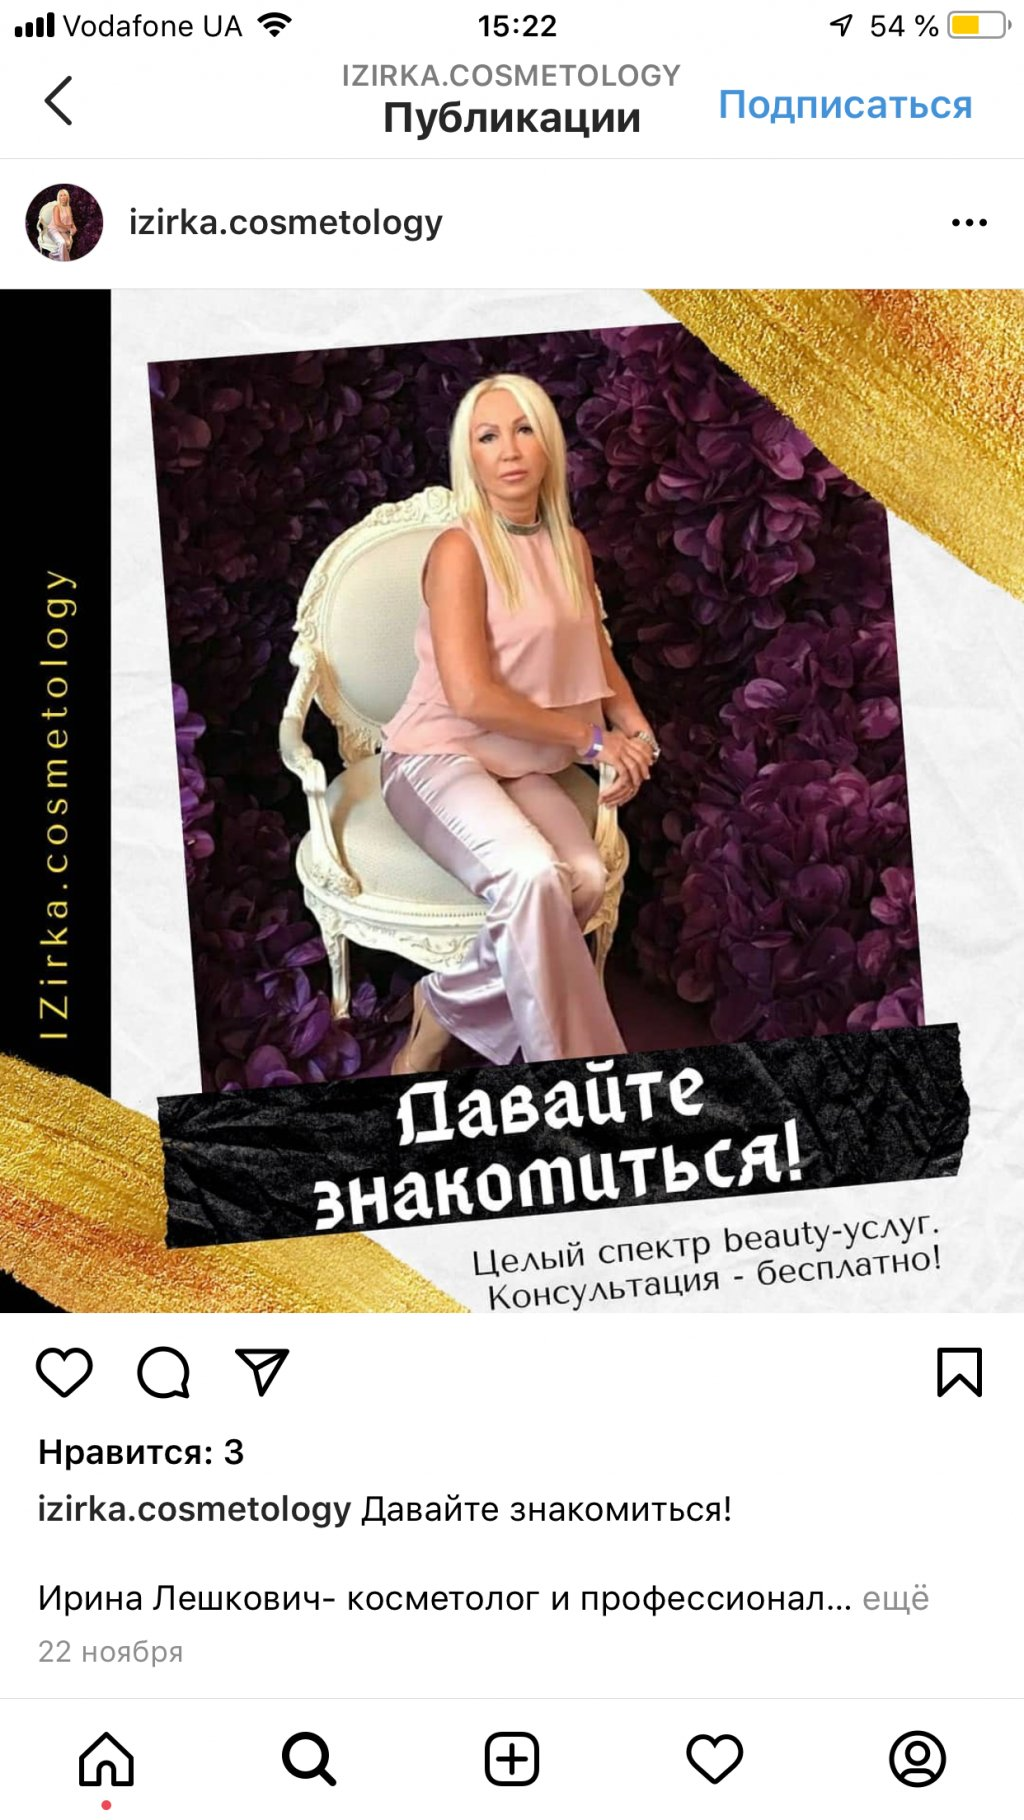 Лешкович Ирина Владимировна